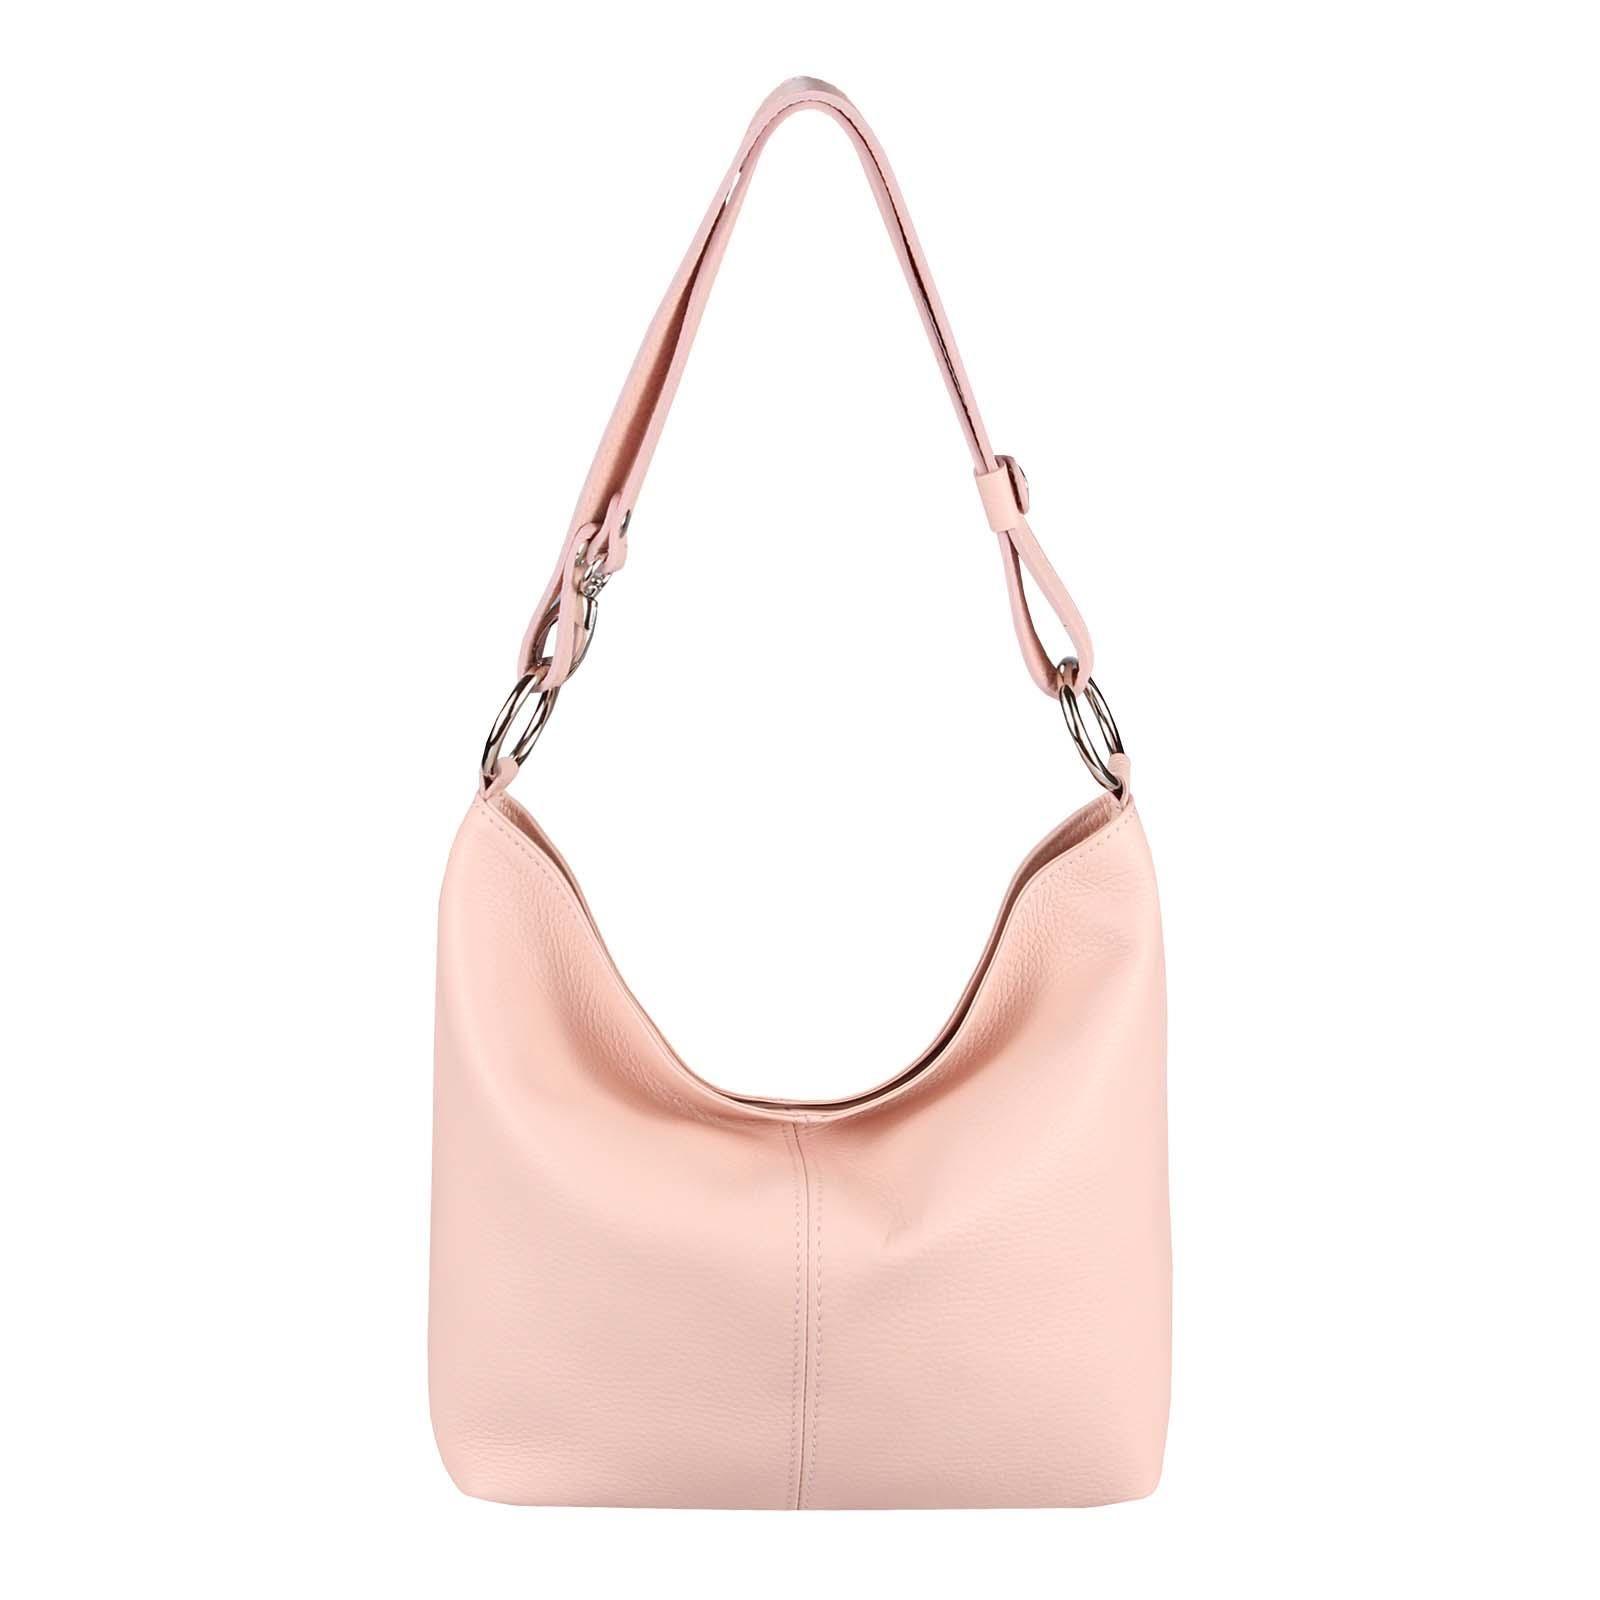 Shopper Schulter Umhänge Hand Tasche Italy Leder Pink Crossover Bag Börse Pelle